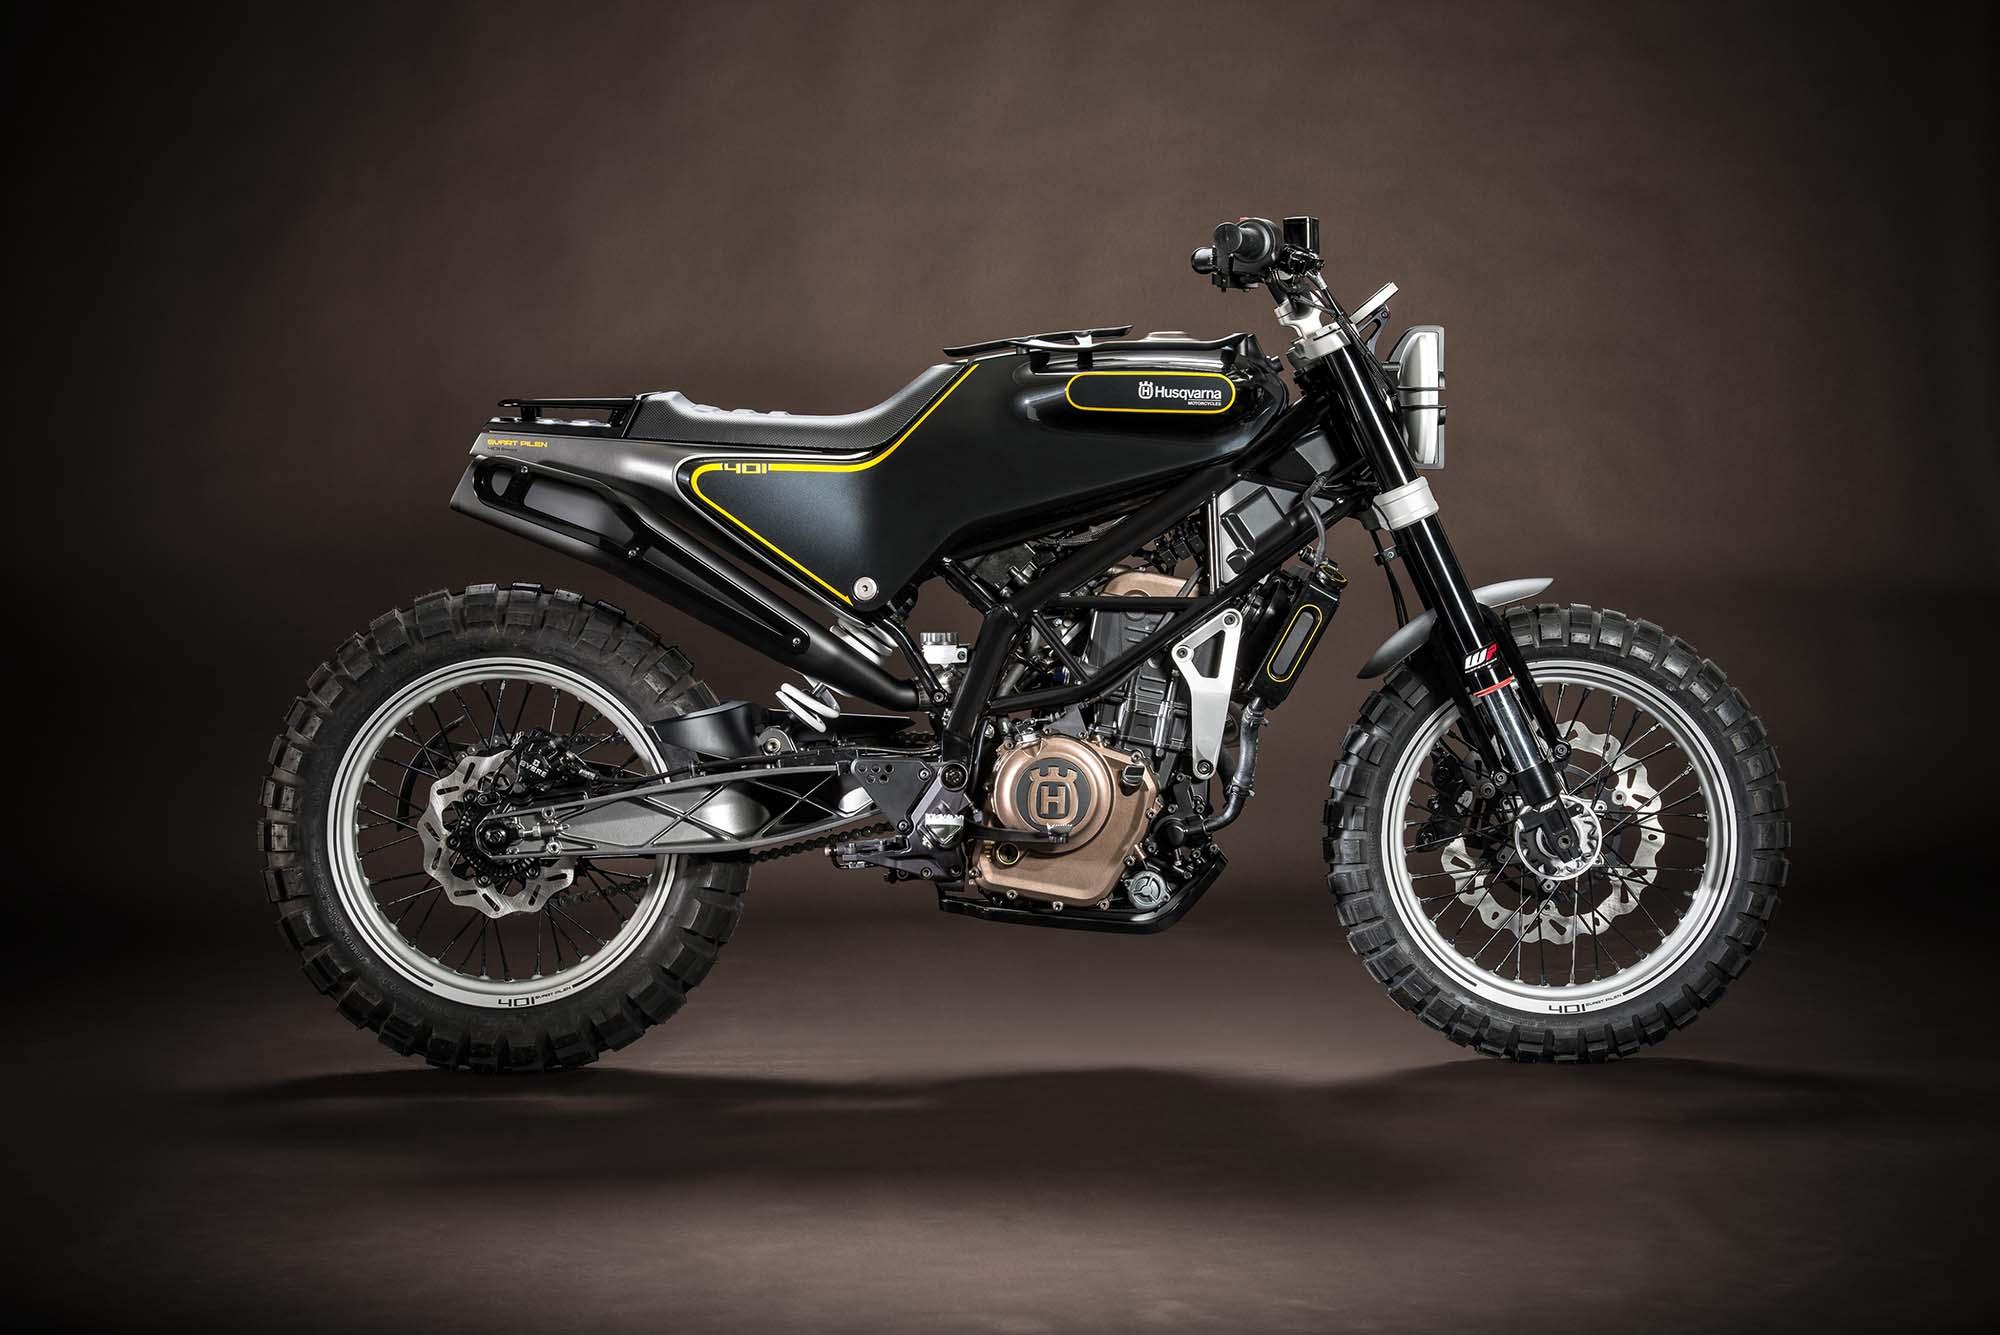 Honda Grom Price >> Husqvarna 401 Svartpilen Concept - Asphalt & Rubber